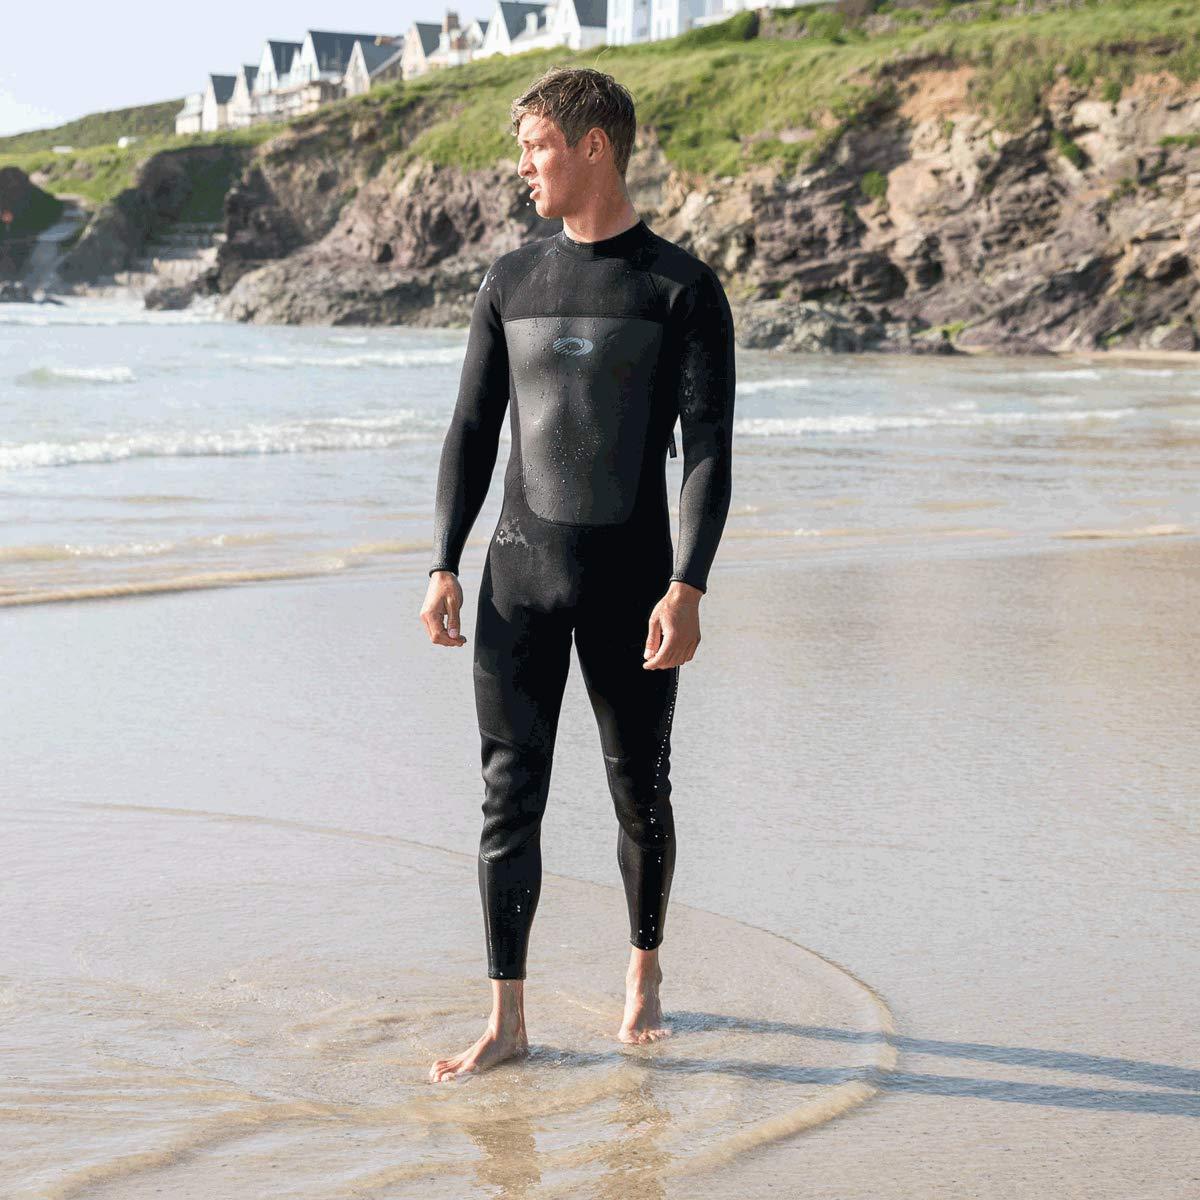 Nero o Rosso Osprey Origin muta surf neoprene uomo invernale lunga 5 mm